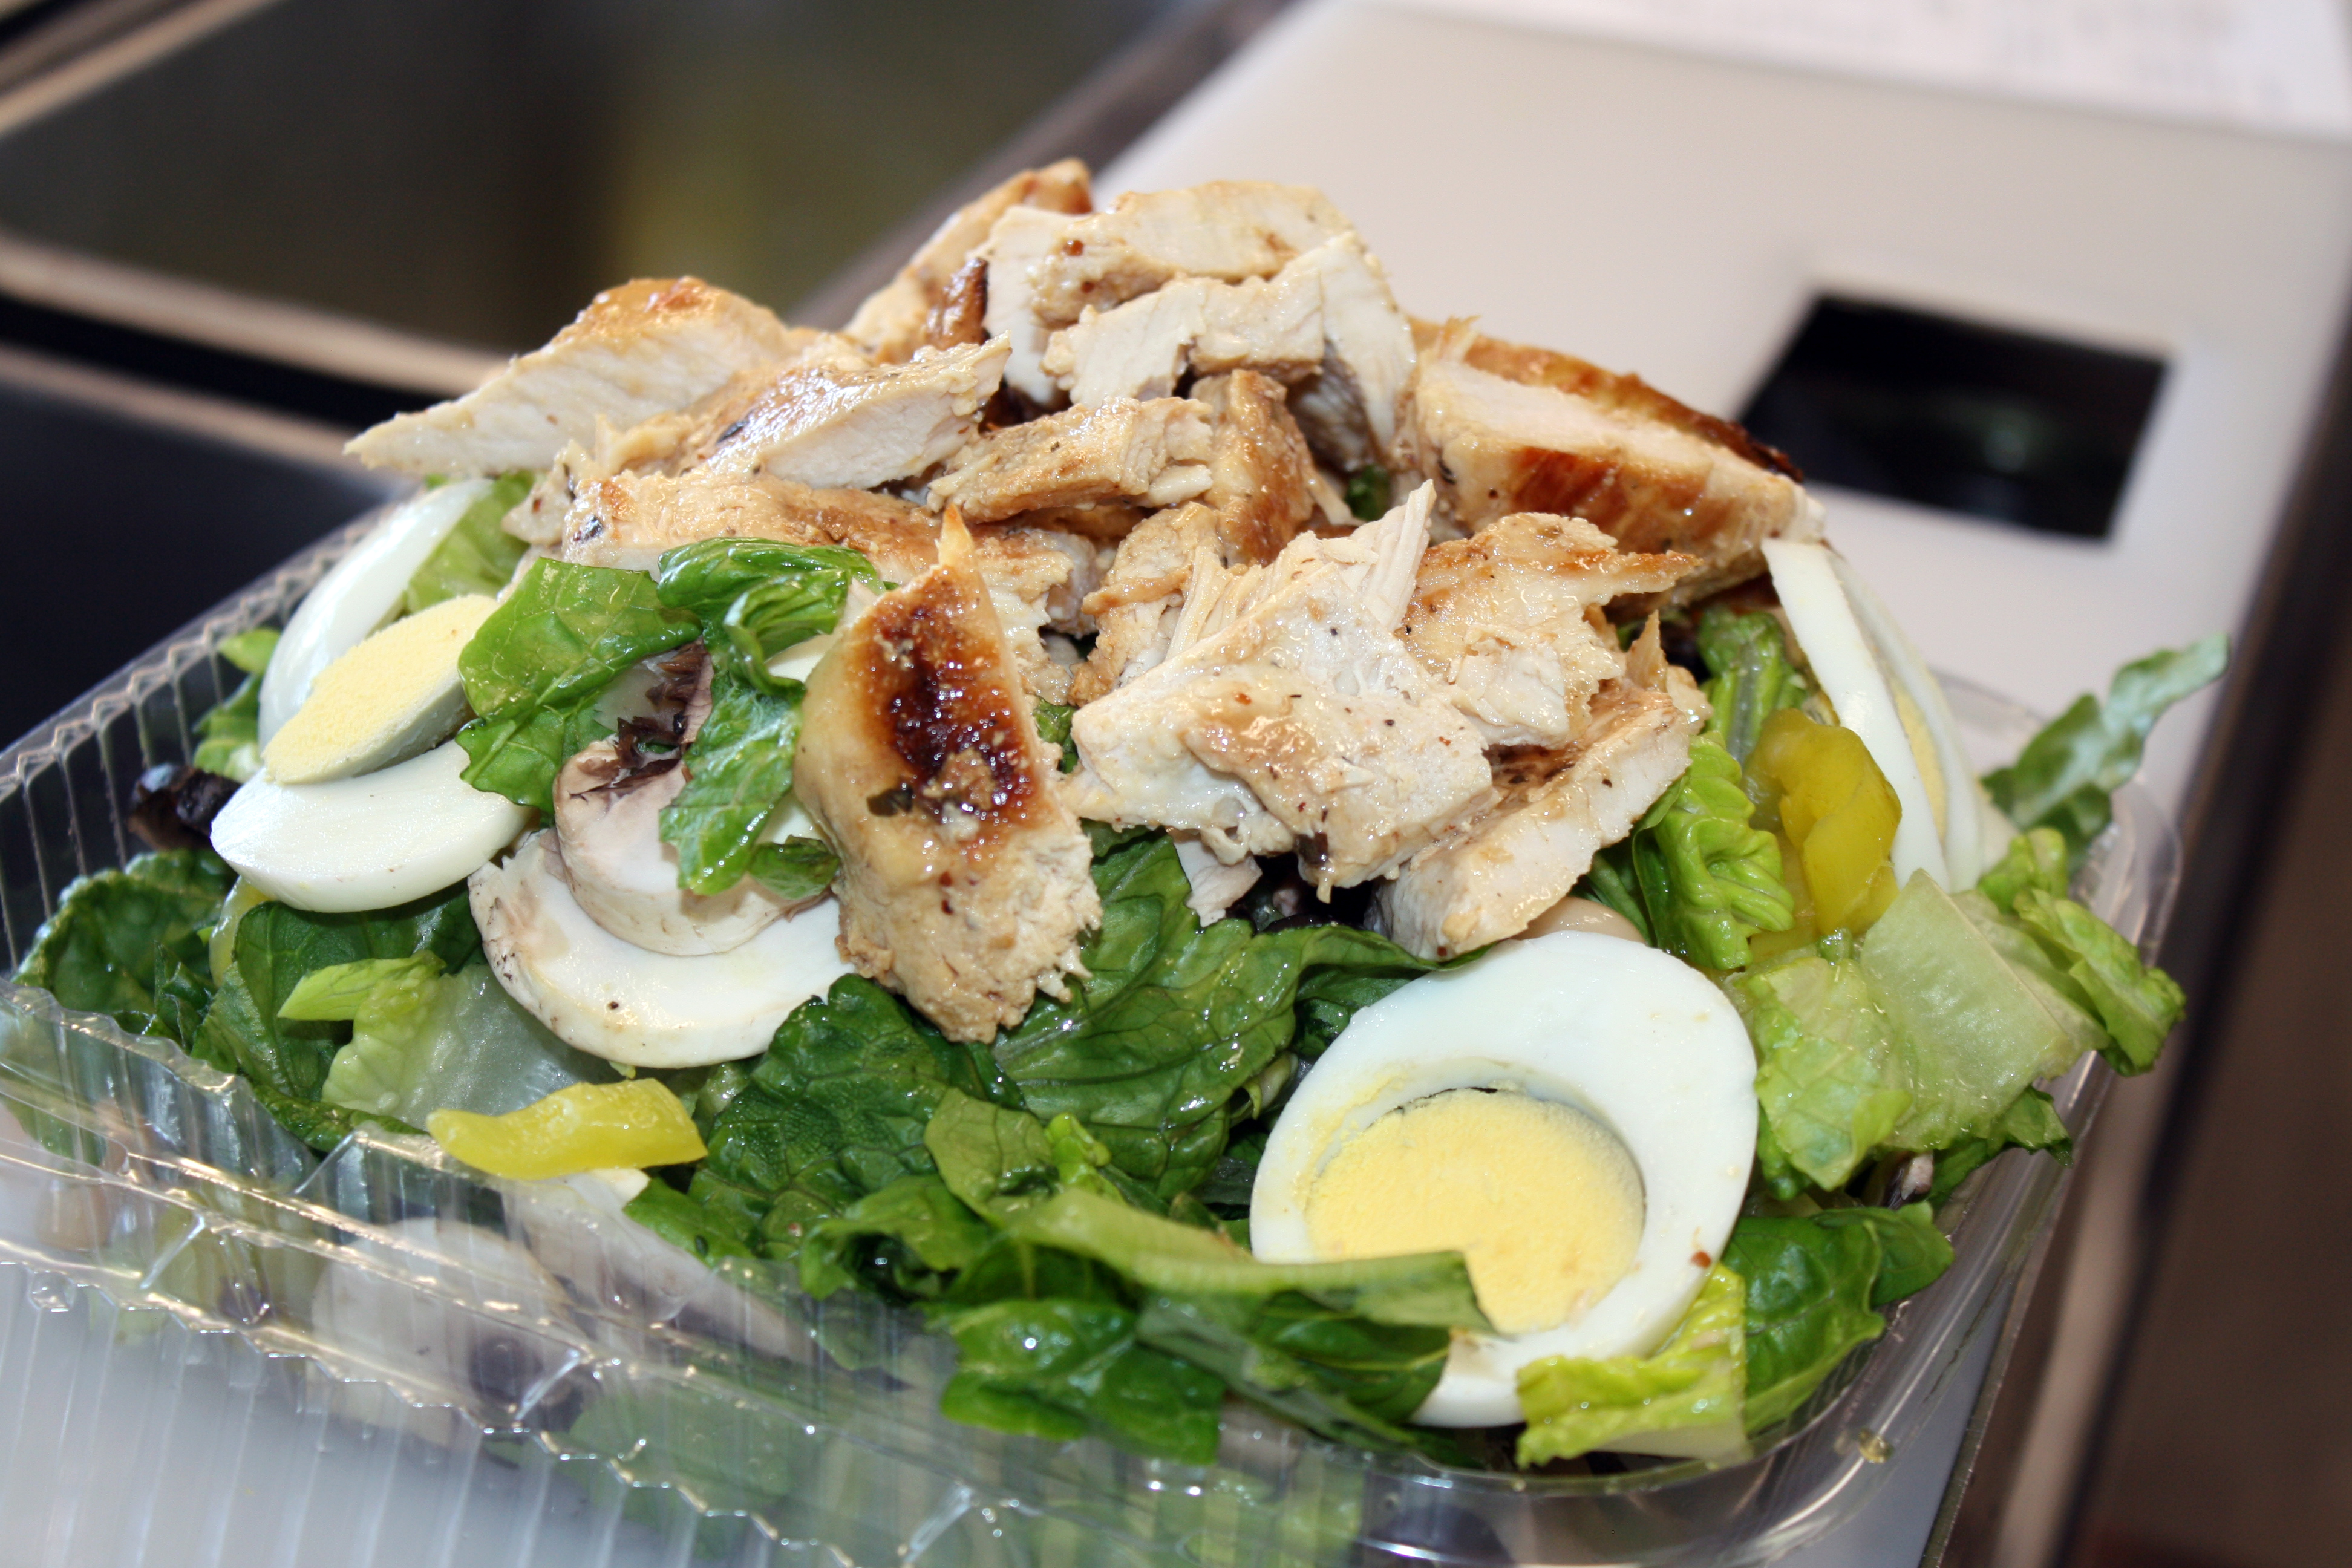 JC Salad